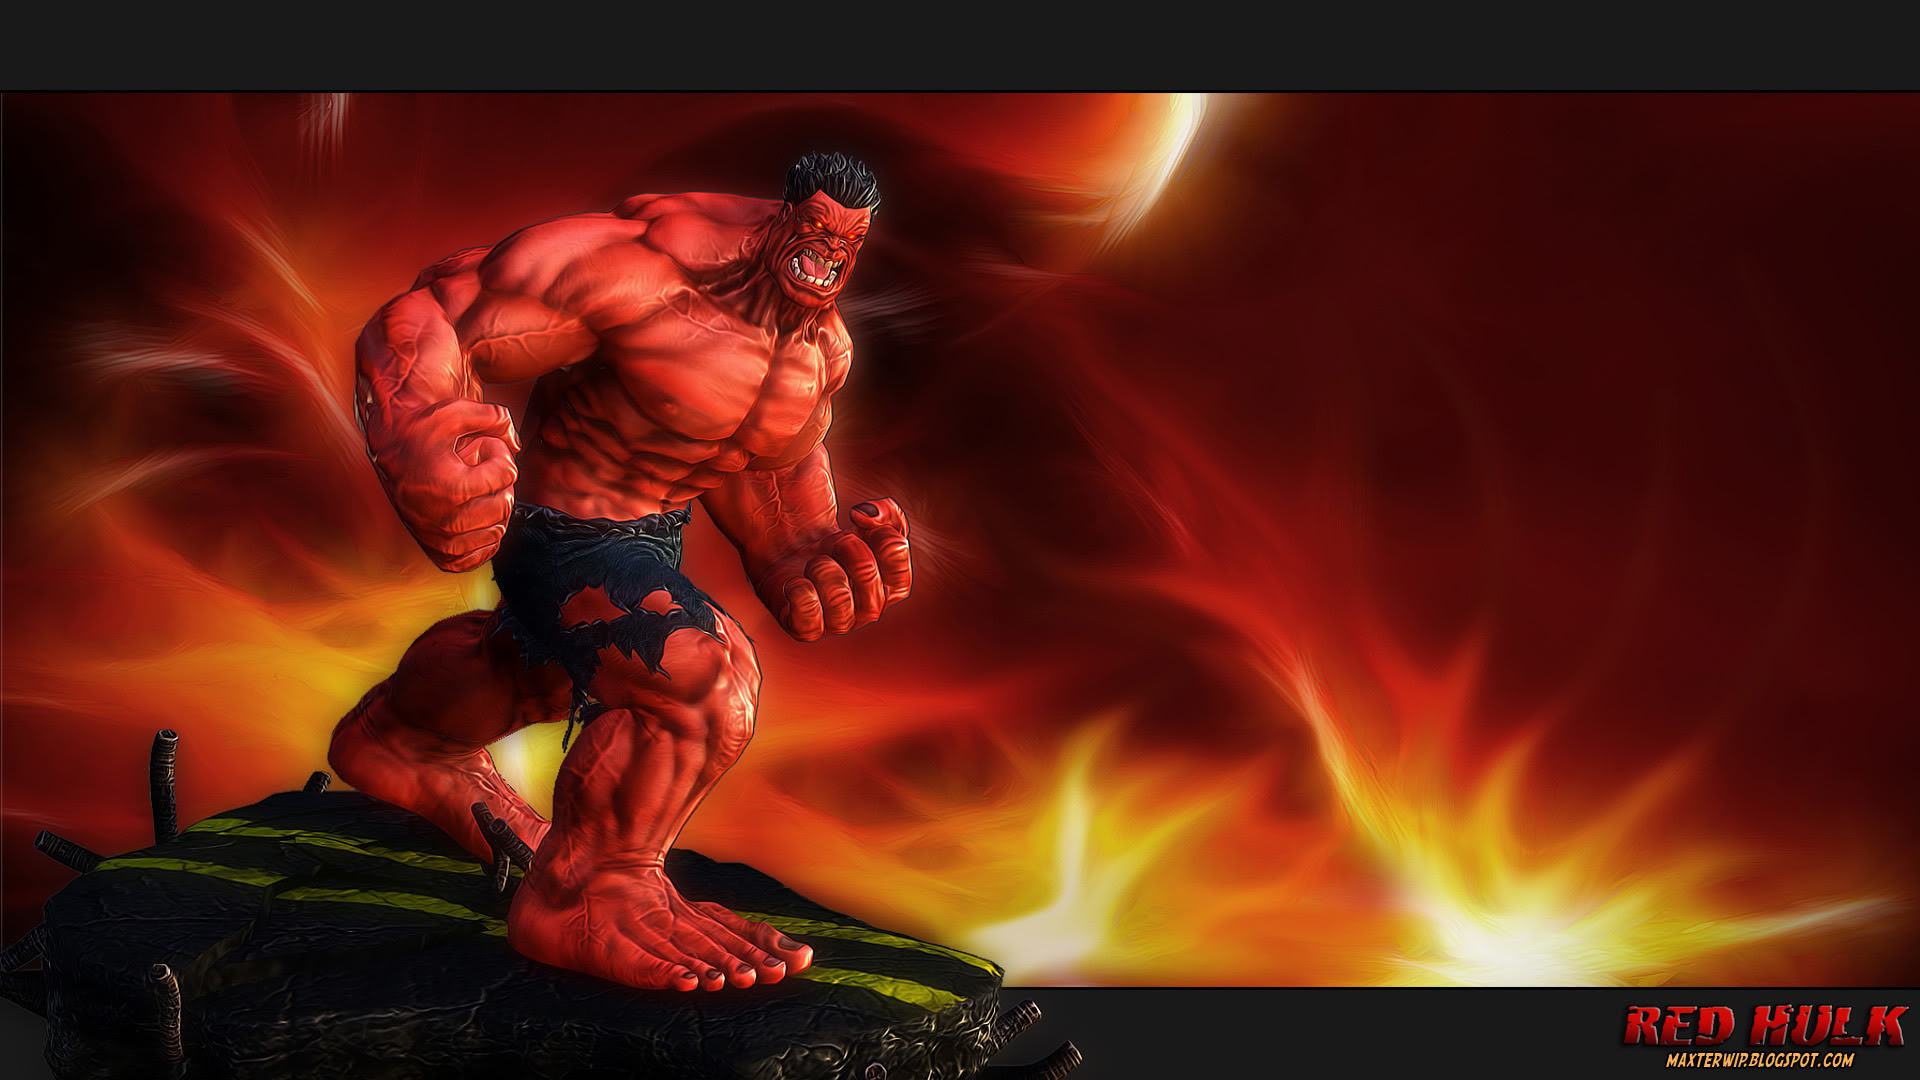 Res: 1920x1080, Red Hulk Wallpaper 15 - 1920 X 1080